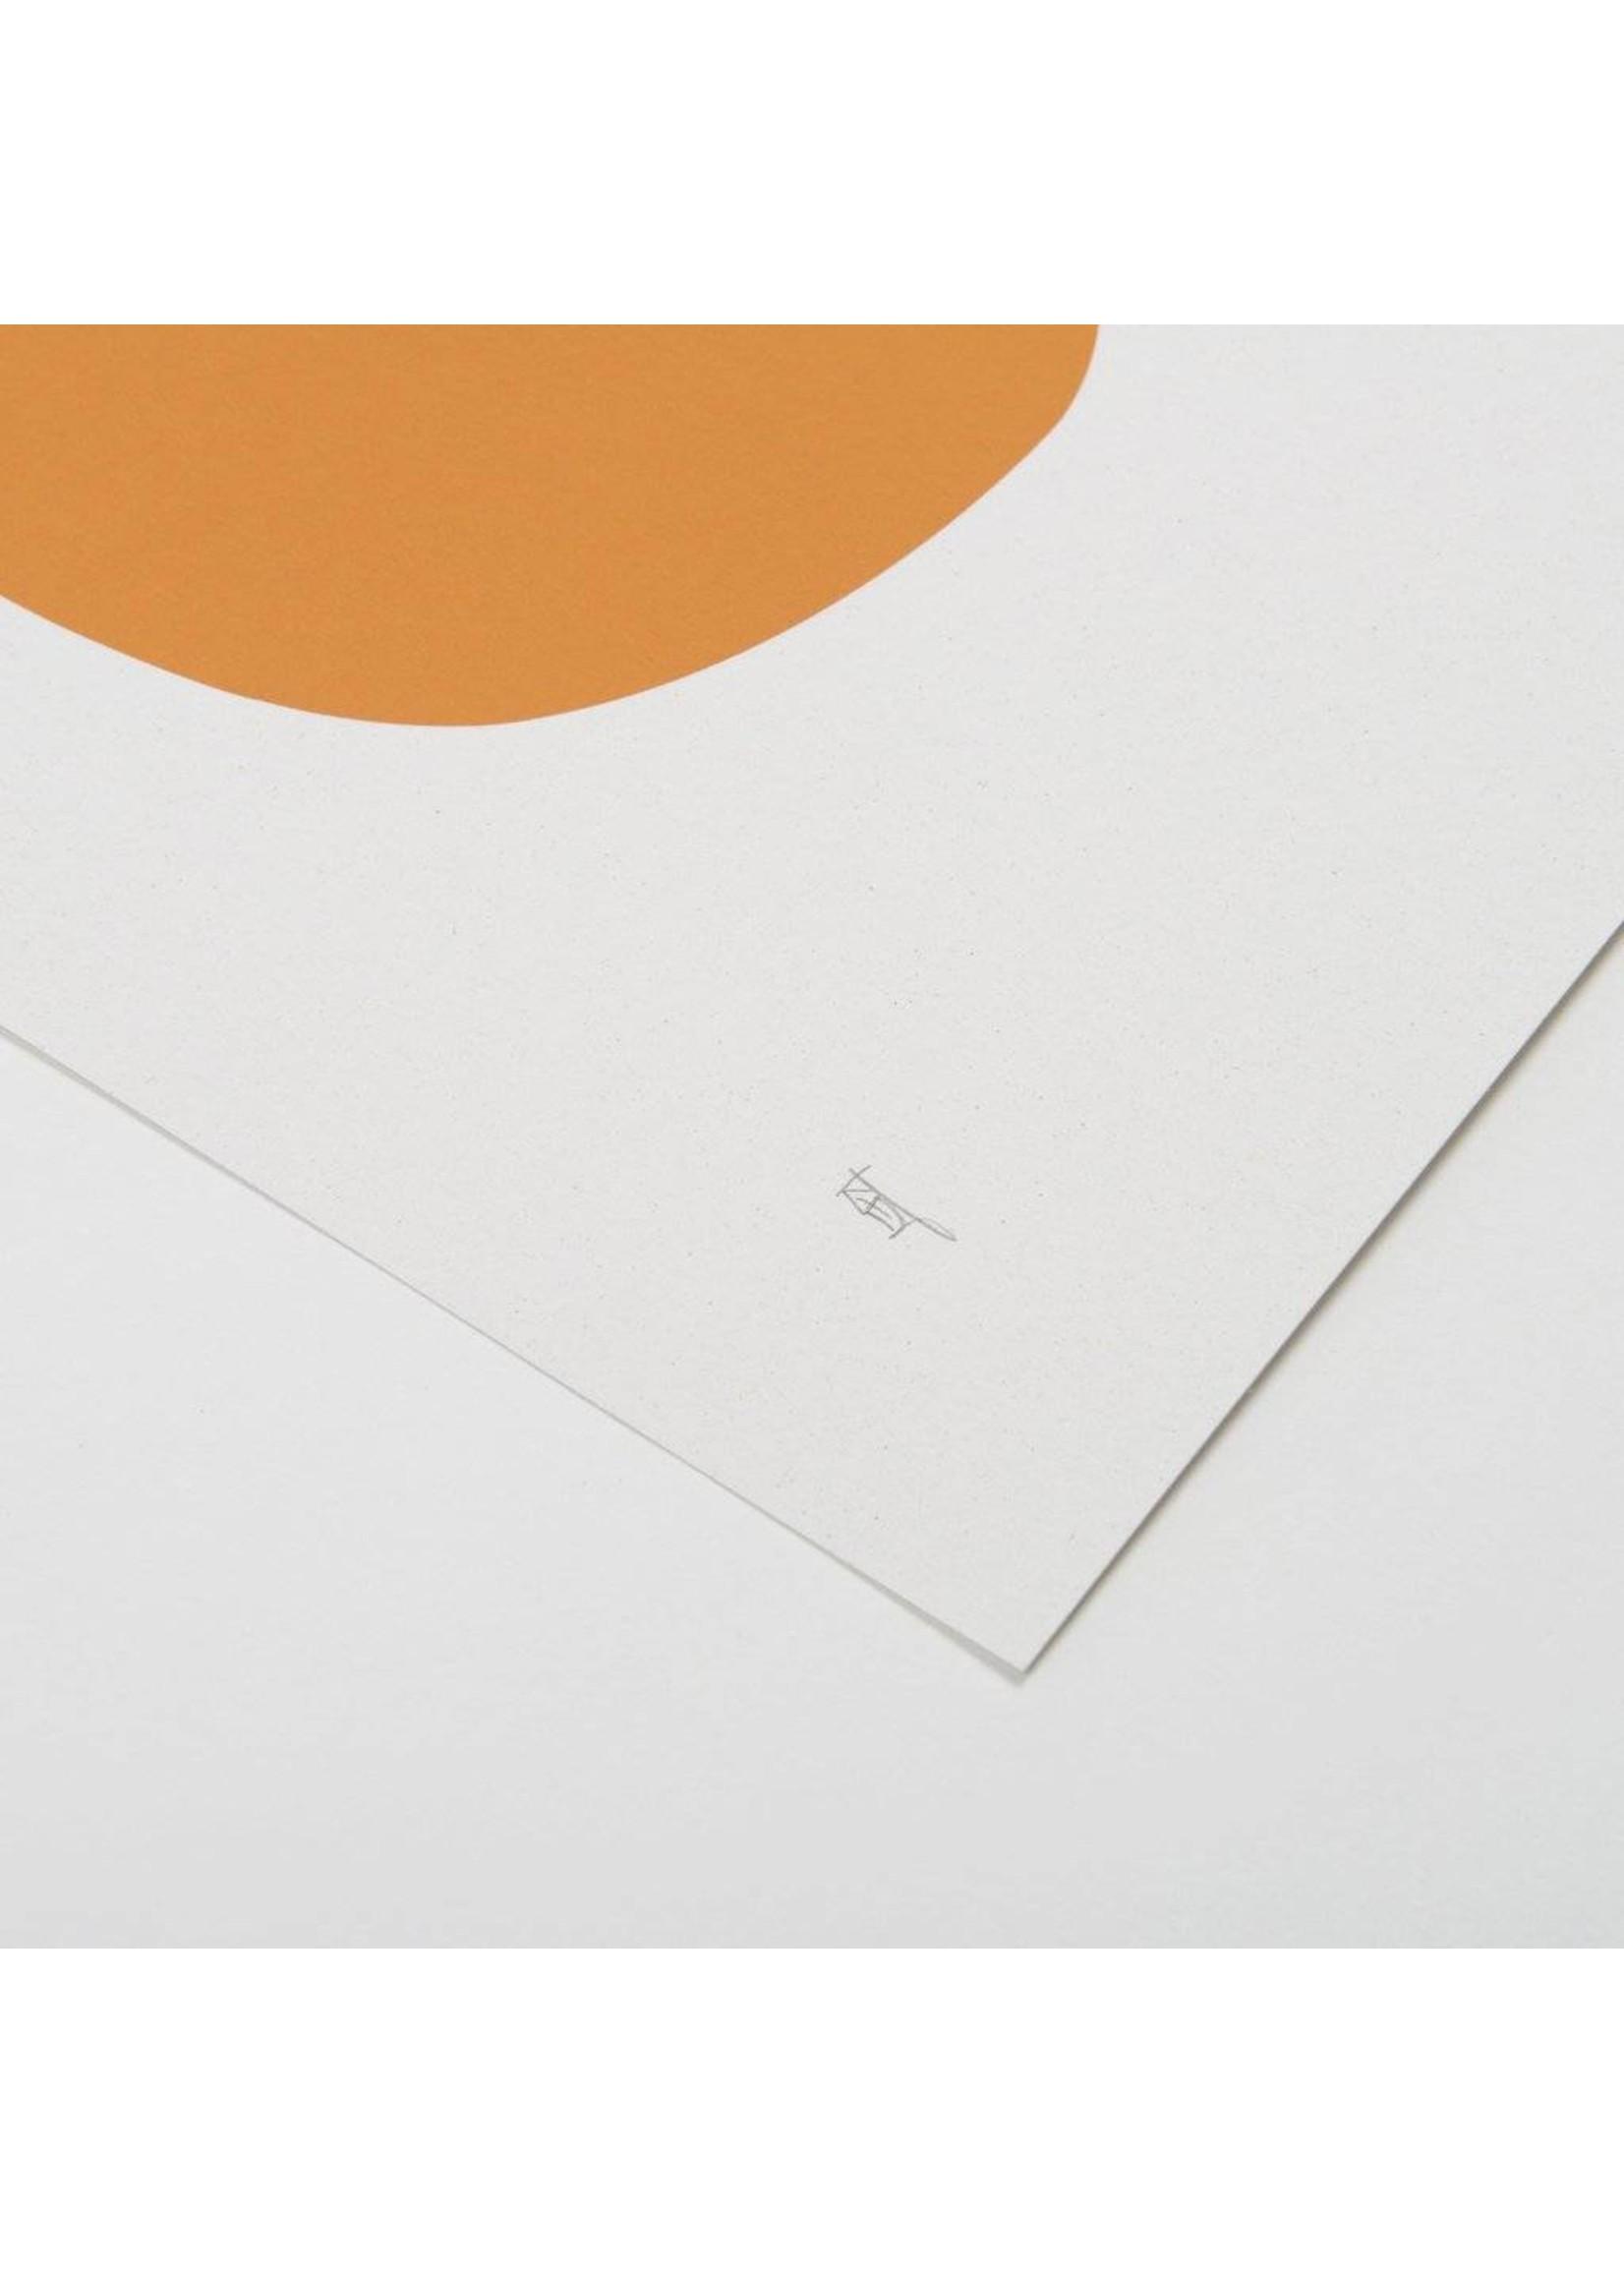 Tom Pigeon Tom Pigeon Cobble Pair Prints - A2